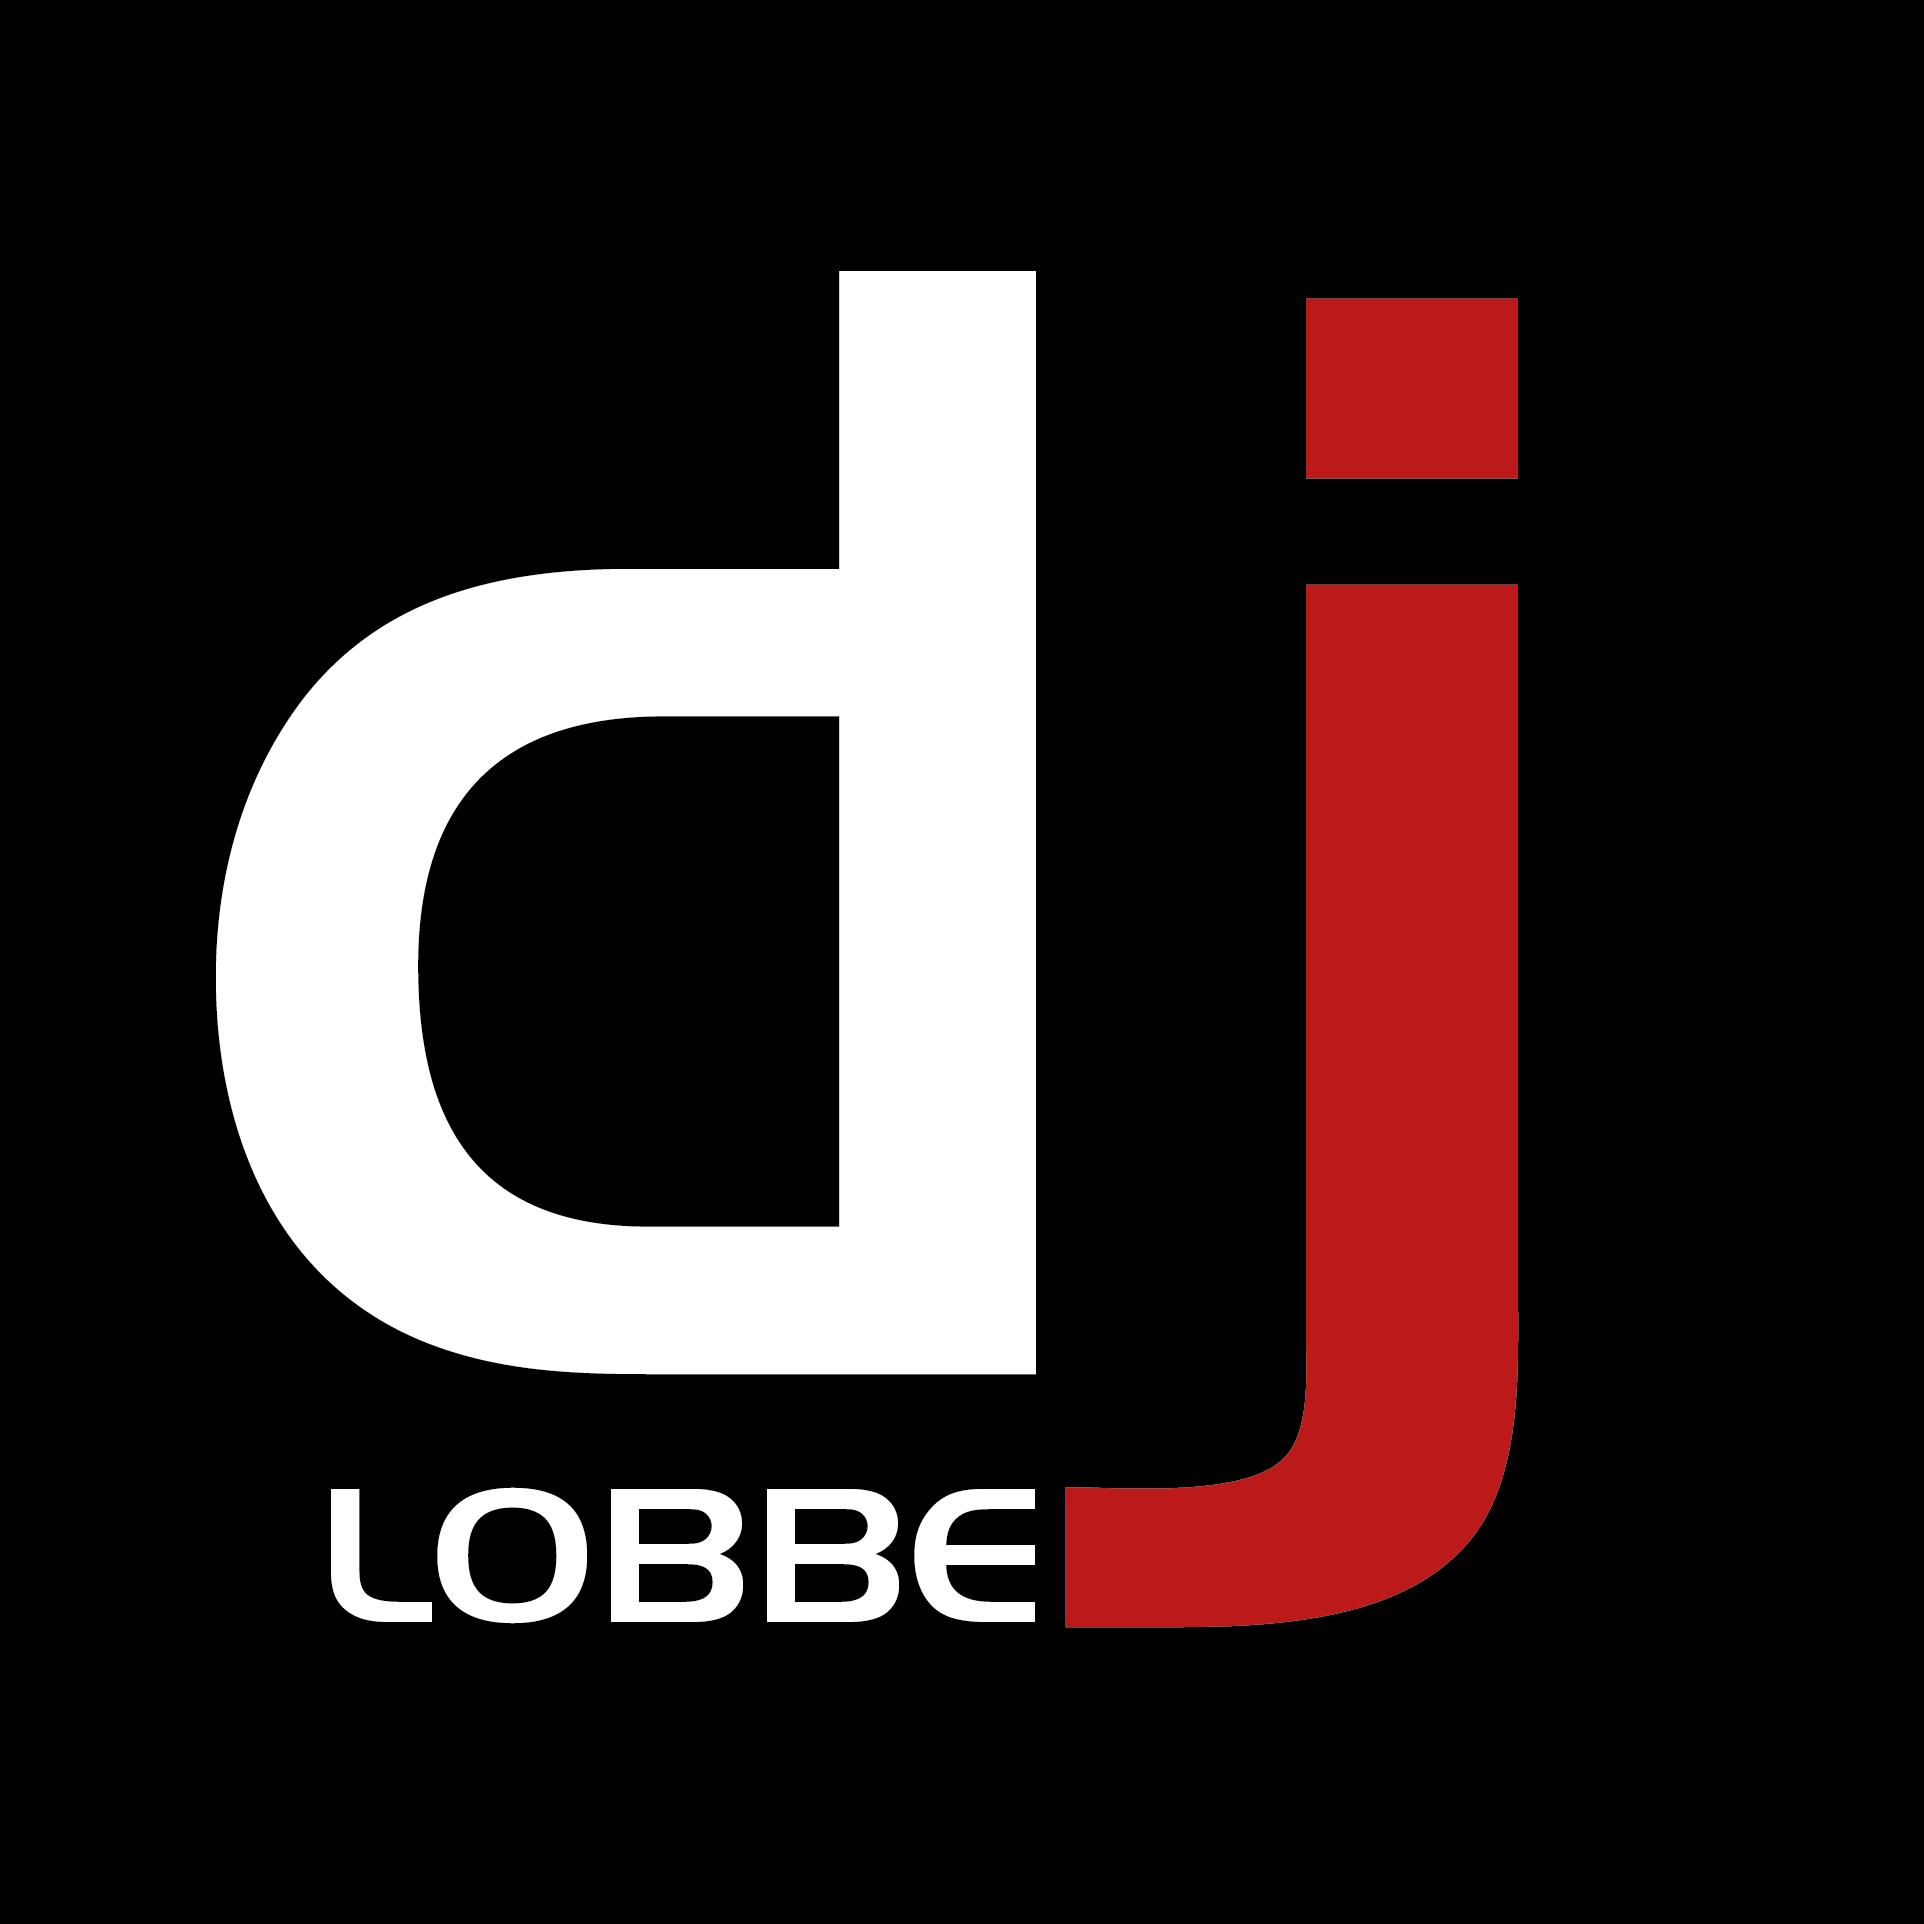 Dj Lobbe